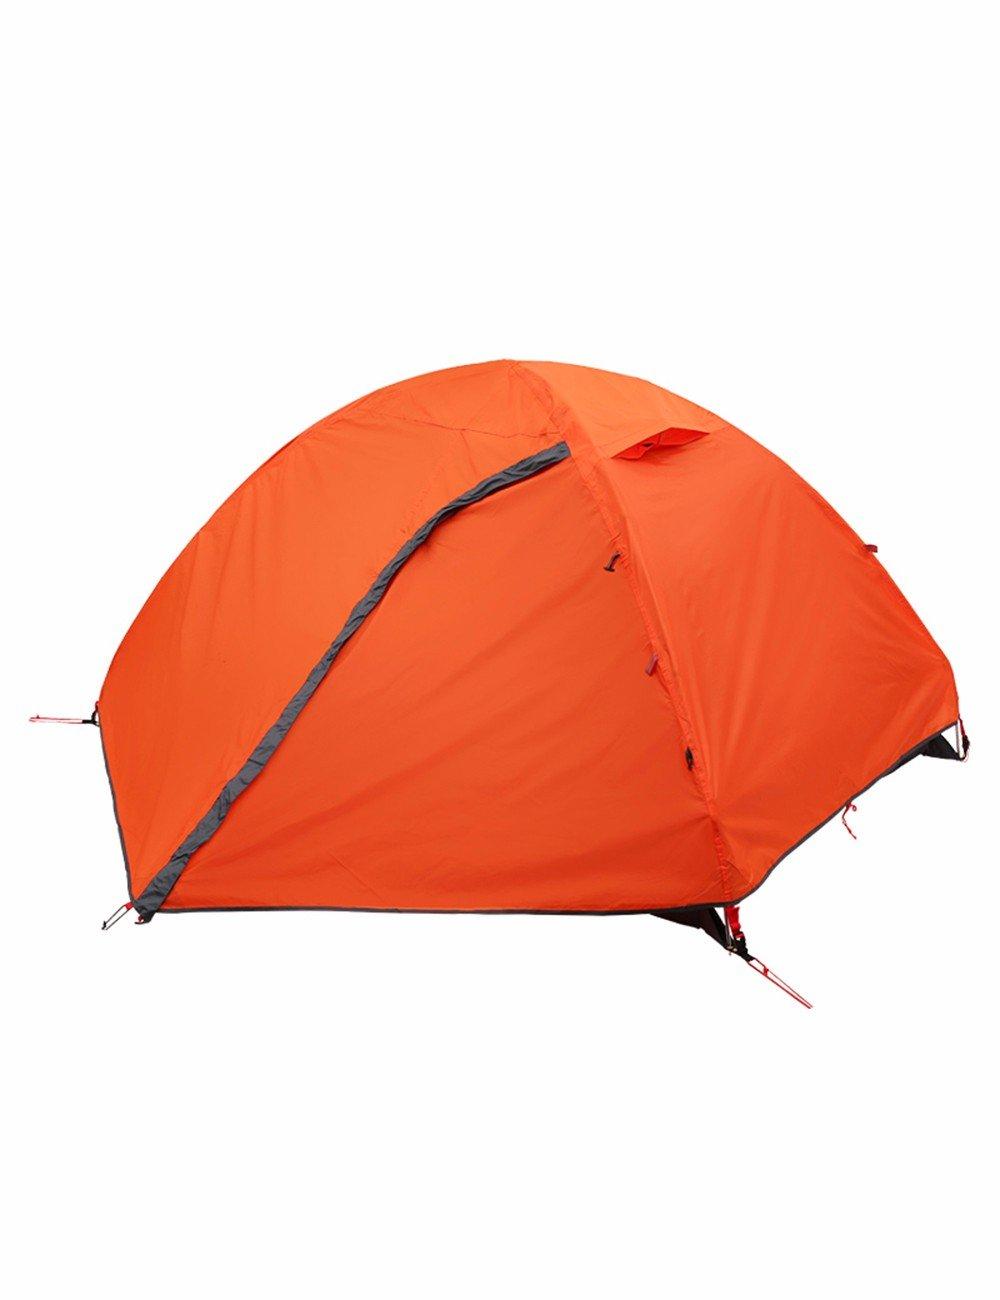 SJQKA-zelte, outdoor, 2 menschen zelt, doppel - regen, reisen, camping, ein doppel - zelt,b